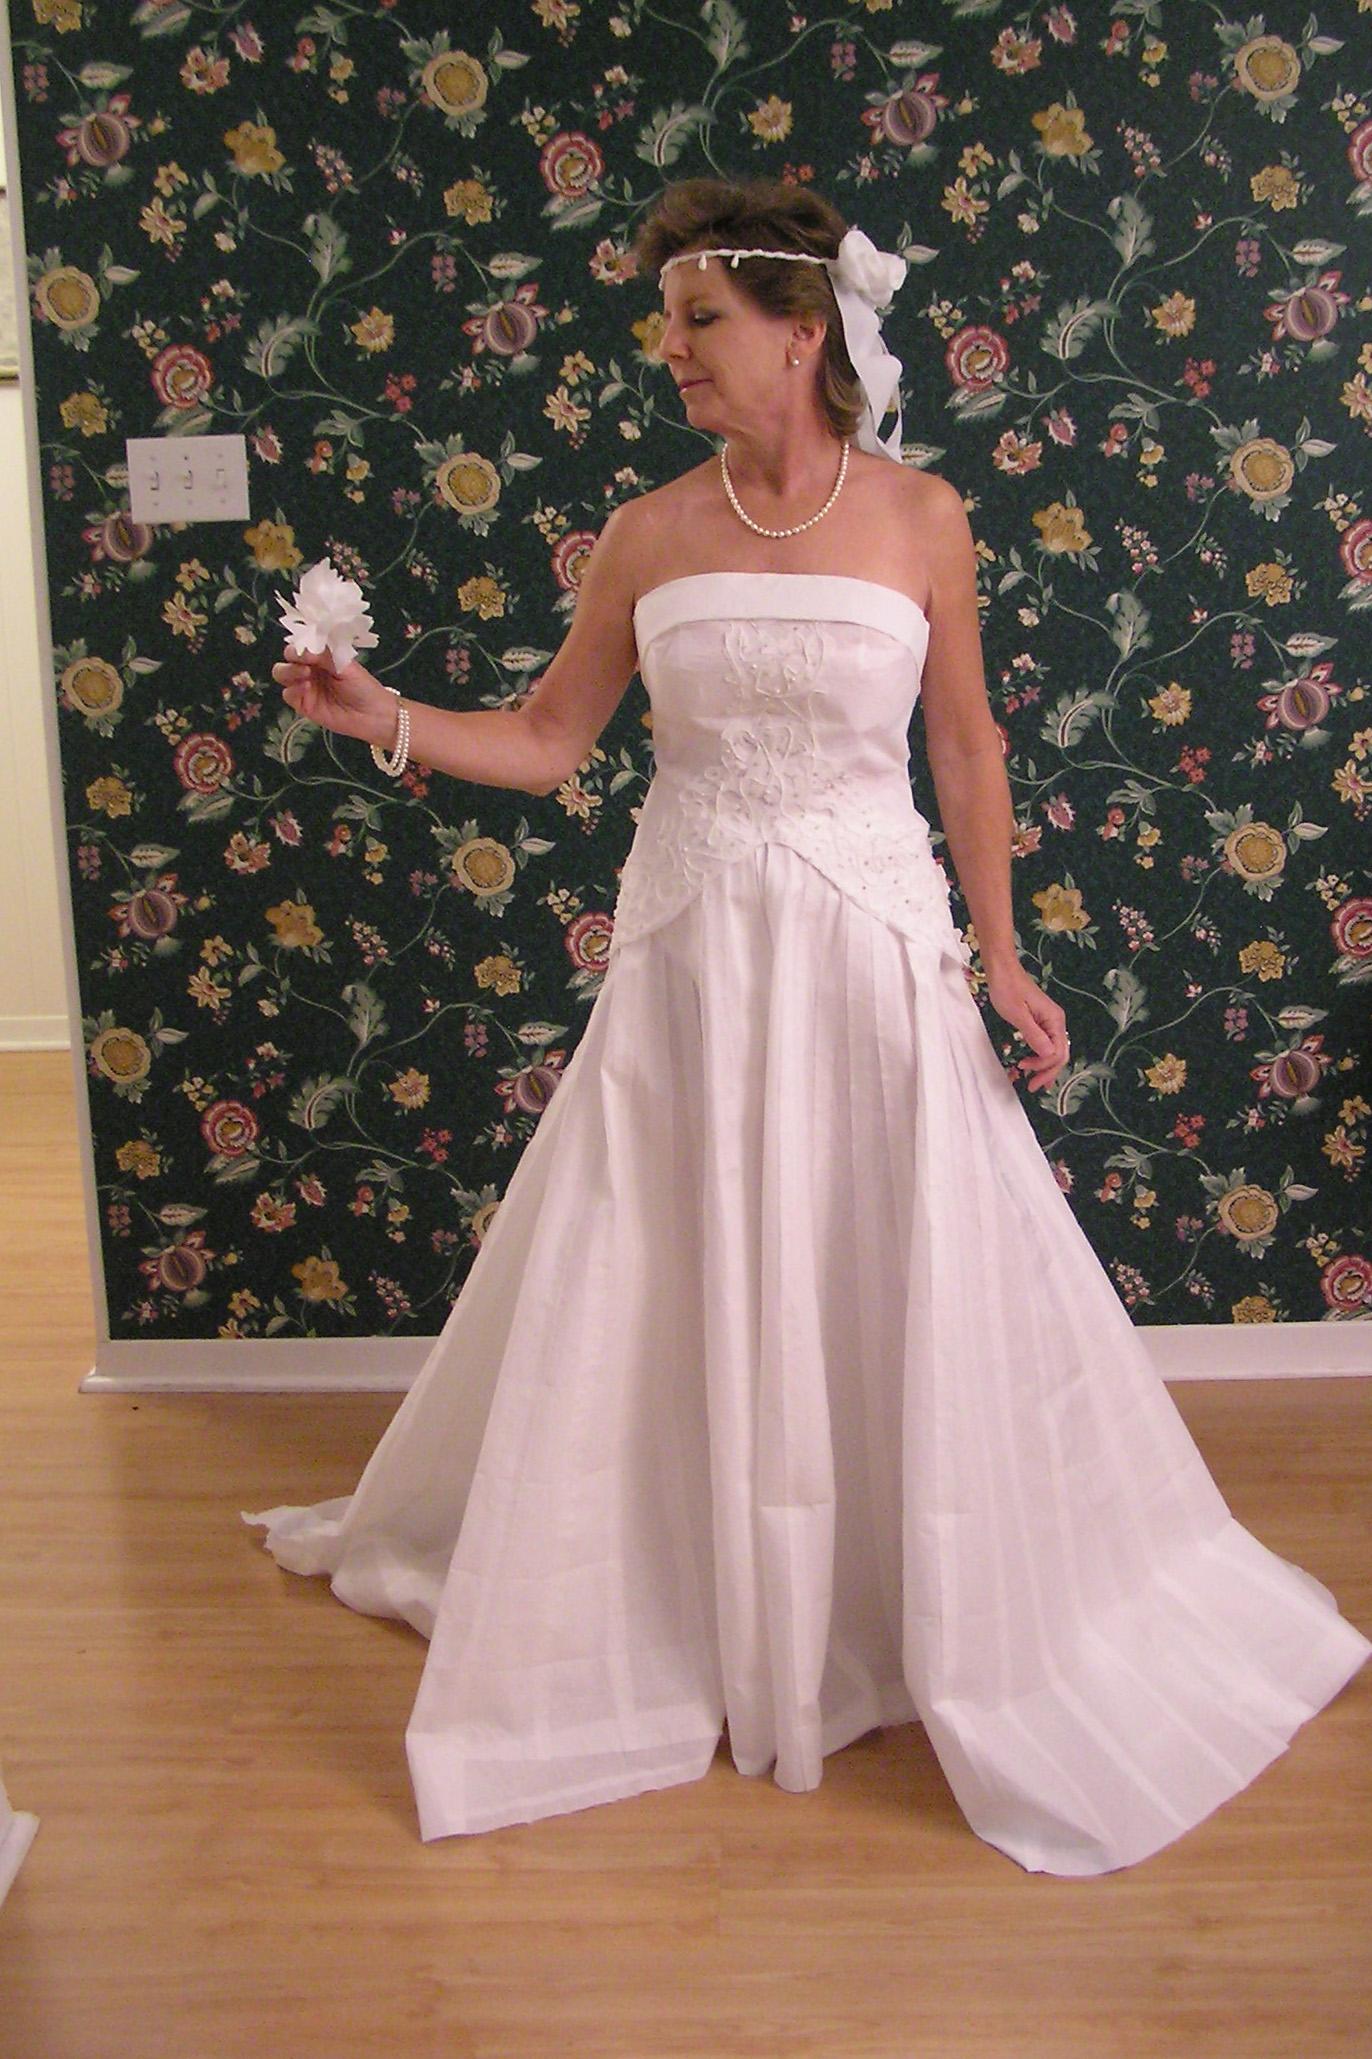 The 2008 Toilet Paper Wedding Dress Contest